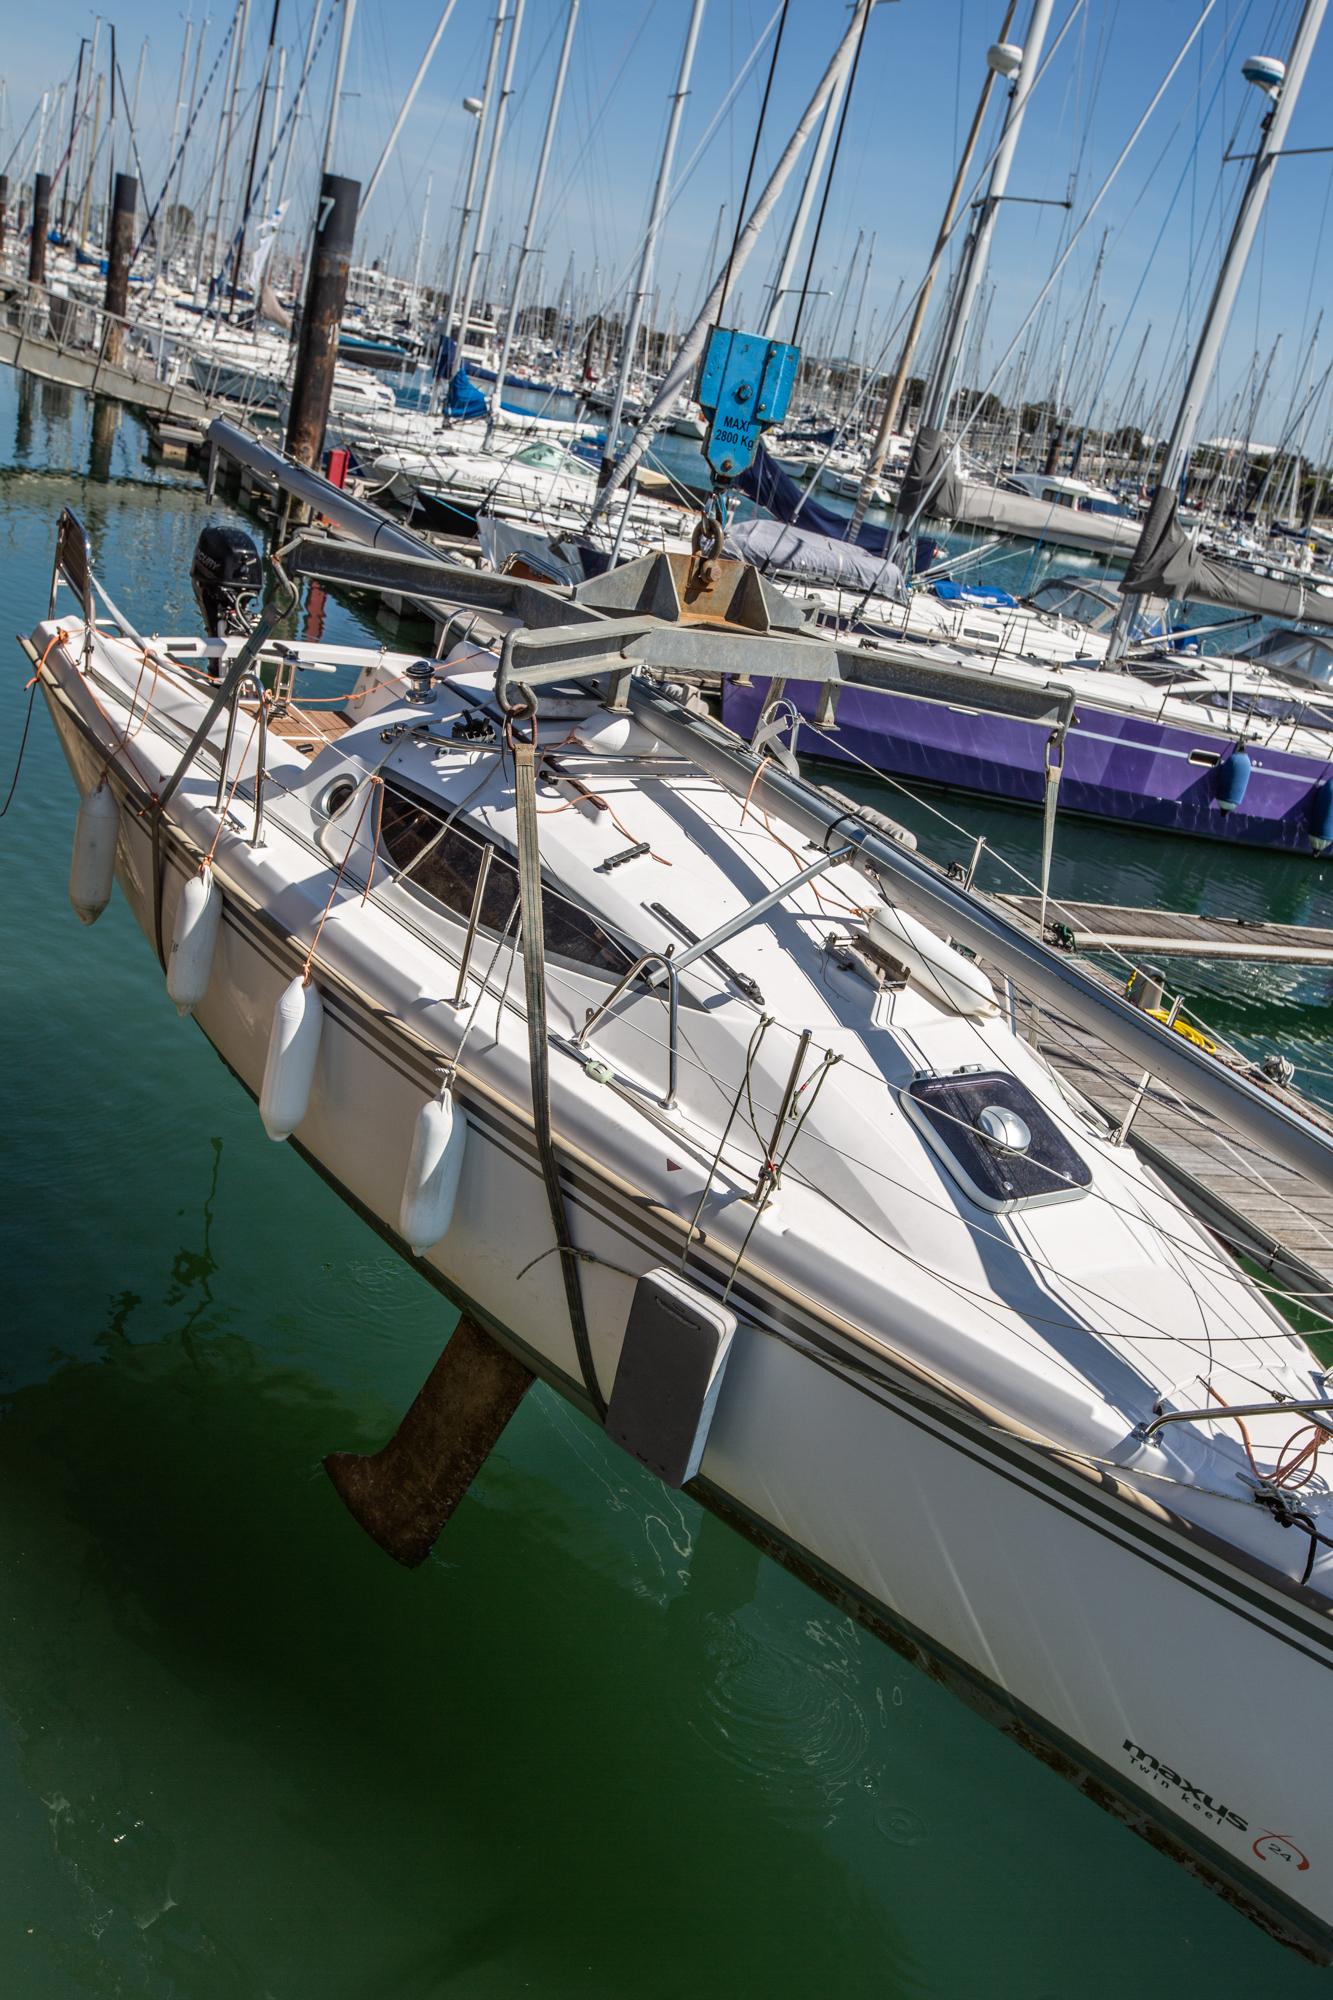 grutage maxus 24 biquille La Rochelle Voyage Amor Fati